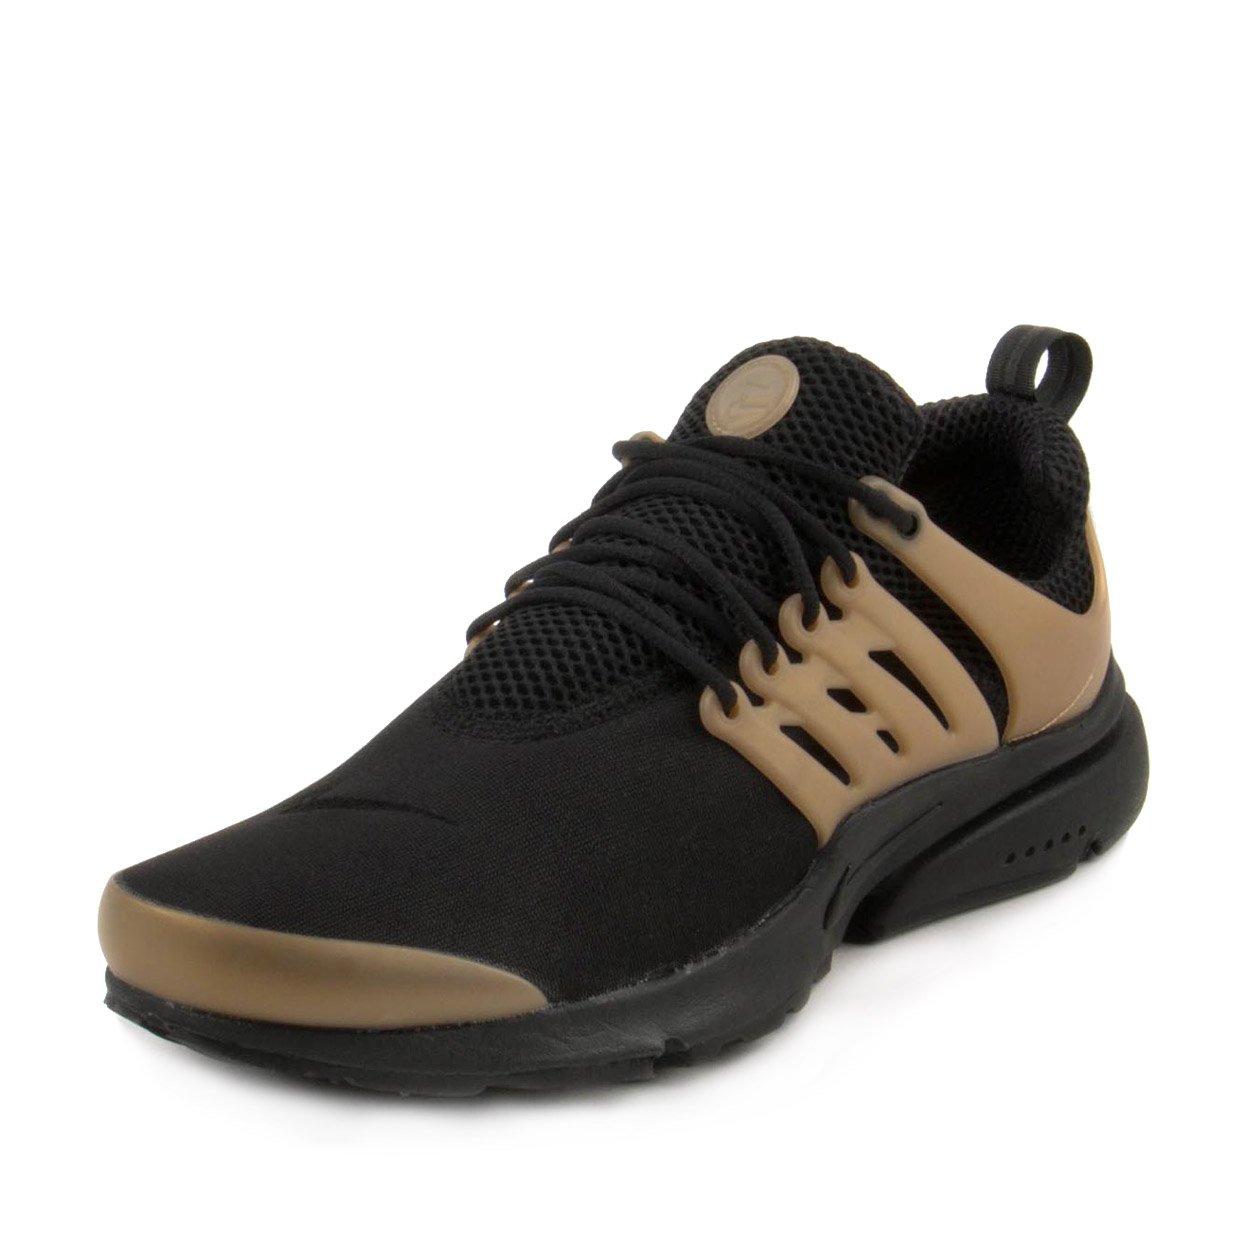 Nike Mens Air Presto Essential Black/Metallic Gold Neoprene Size 14